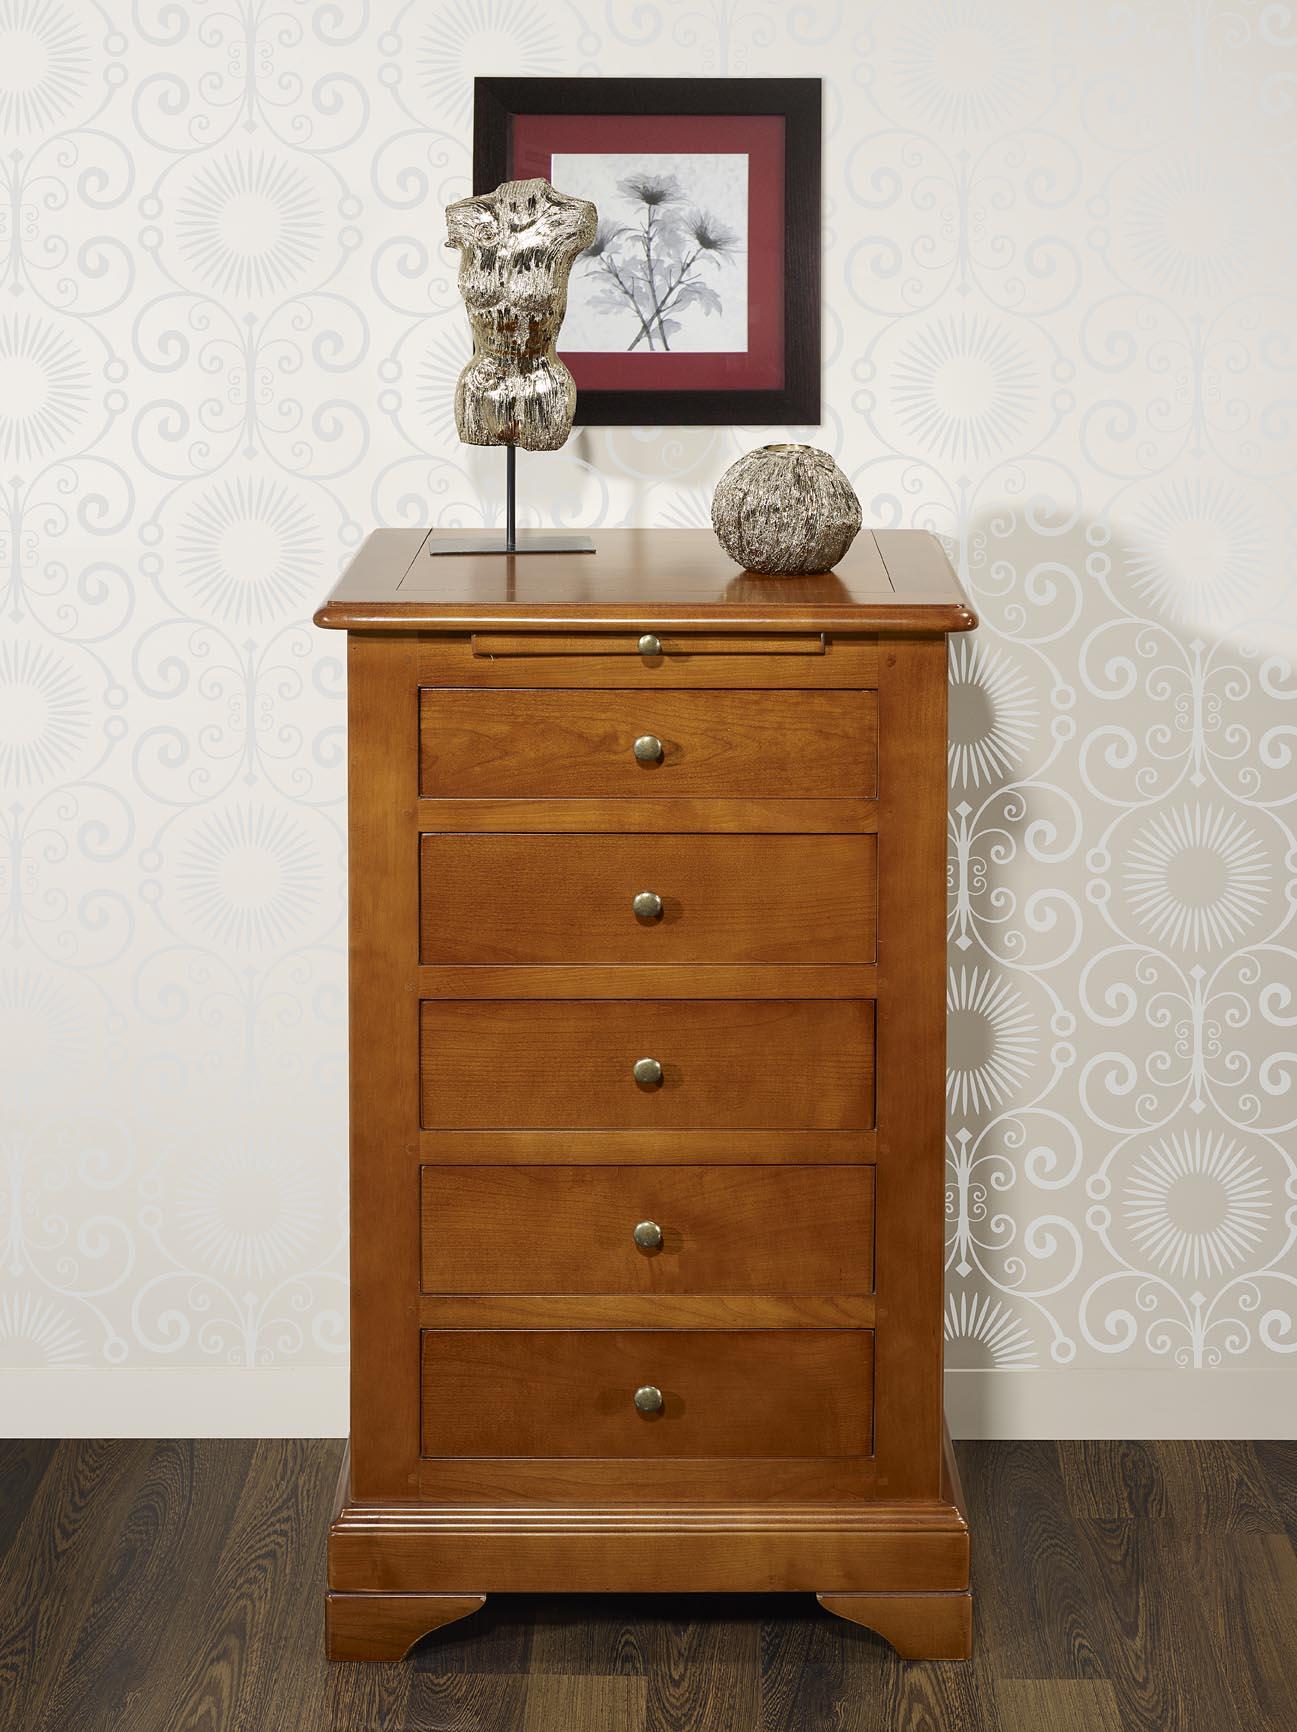 chiffonnier 5 tiroirs en merisier massif de style louis philippe meuble en merisier. Black Bedroom Furniture Sets. Home Design Ideas